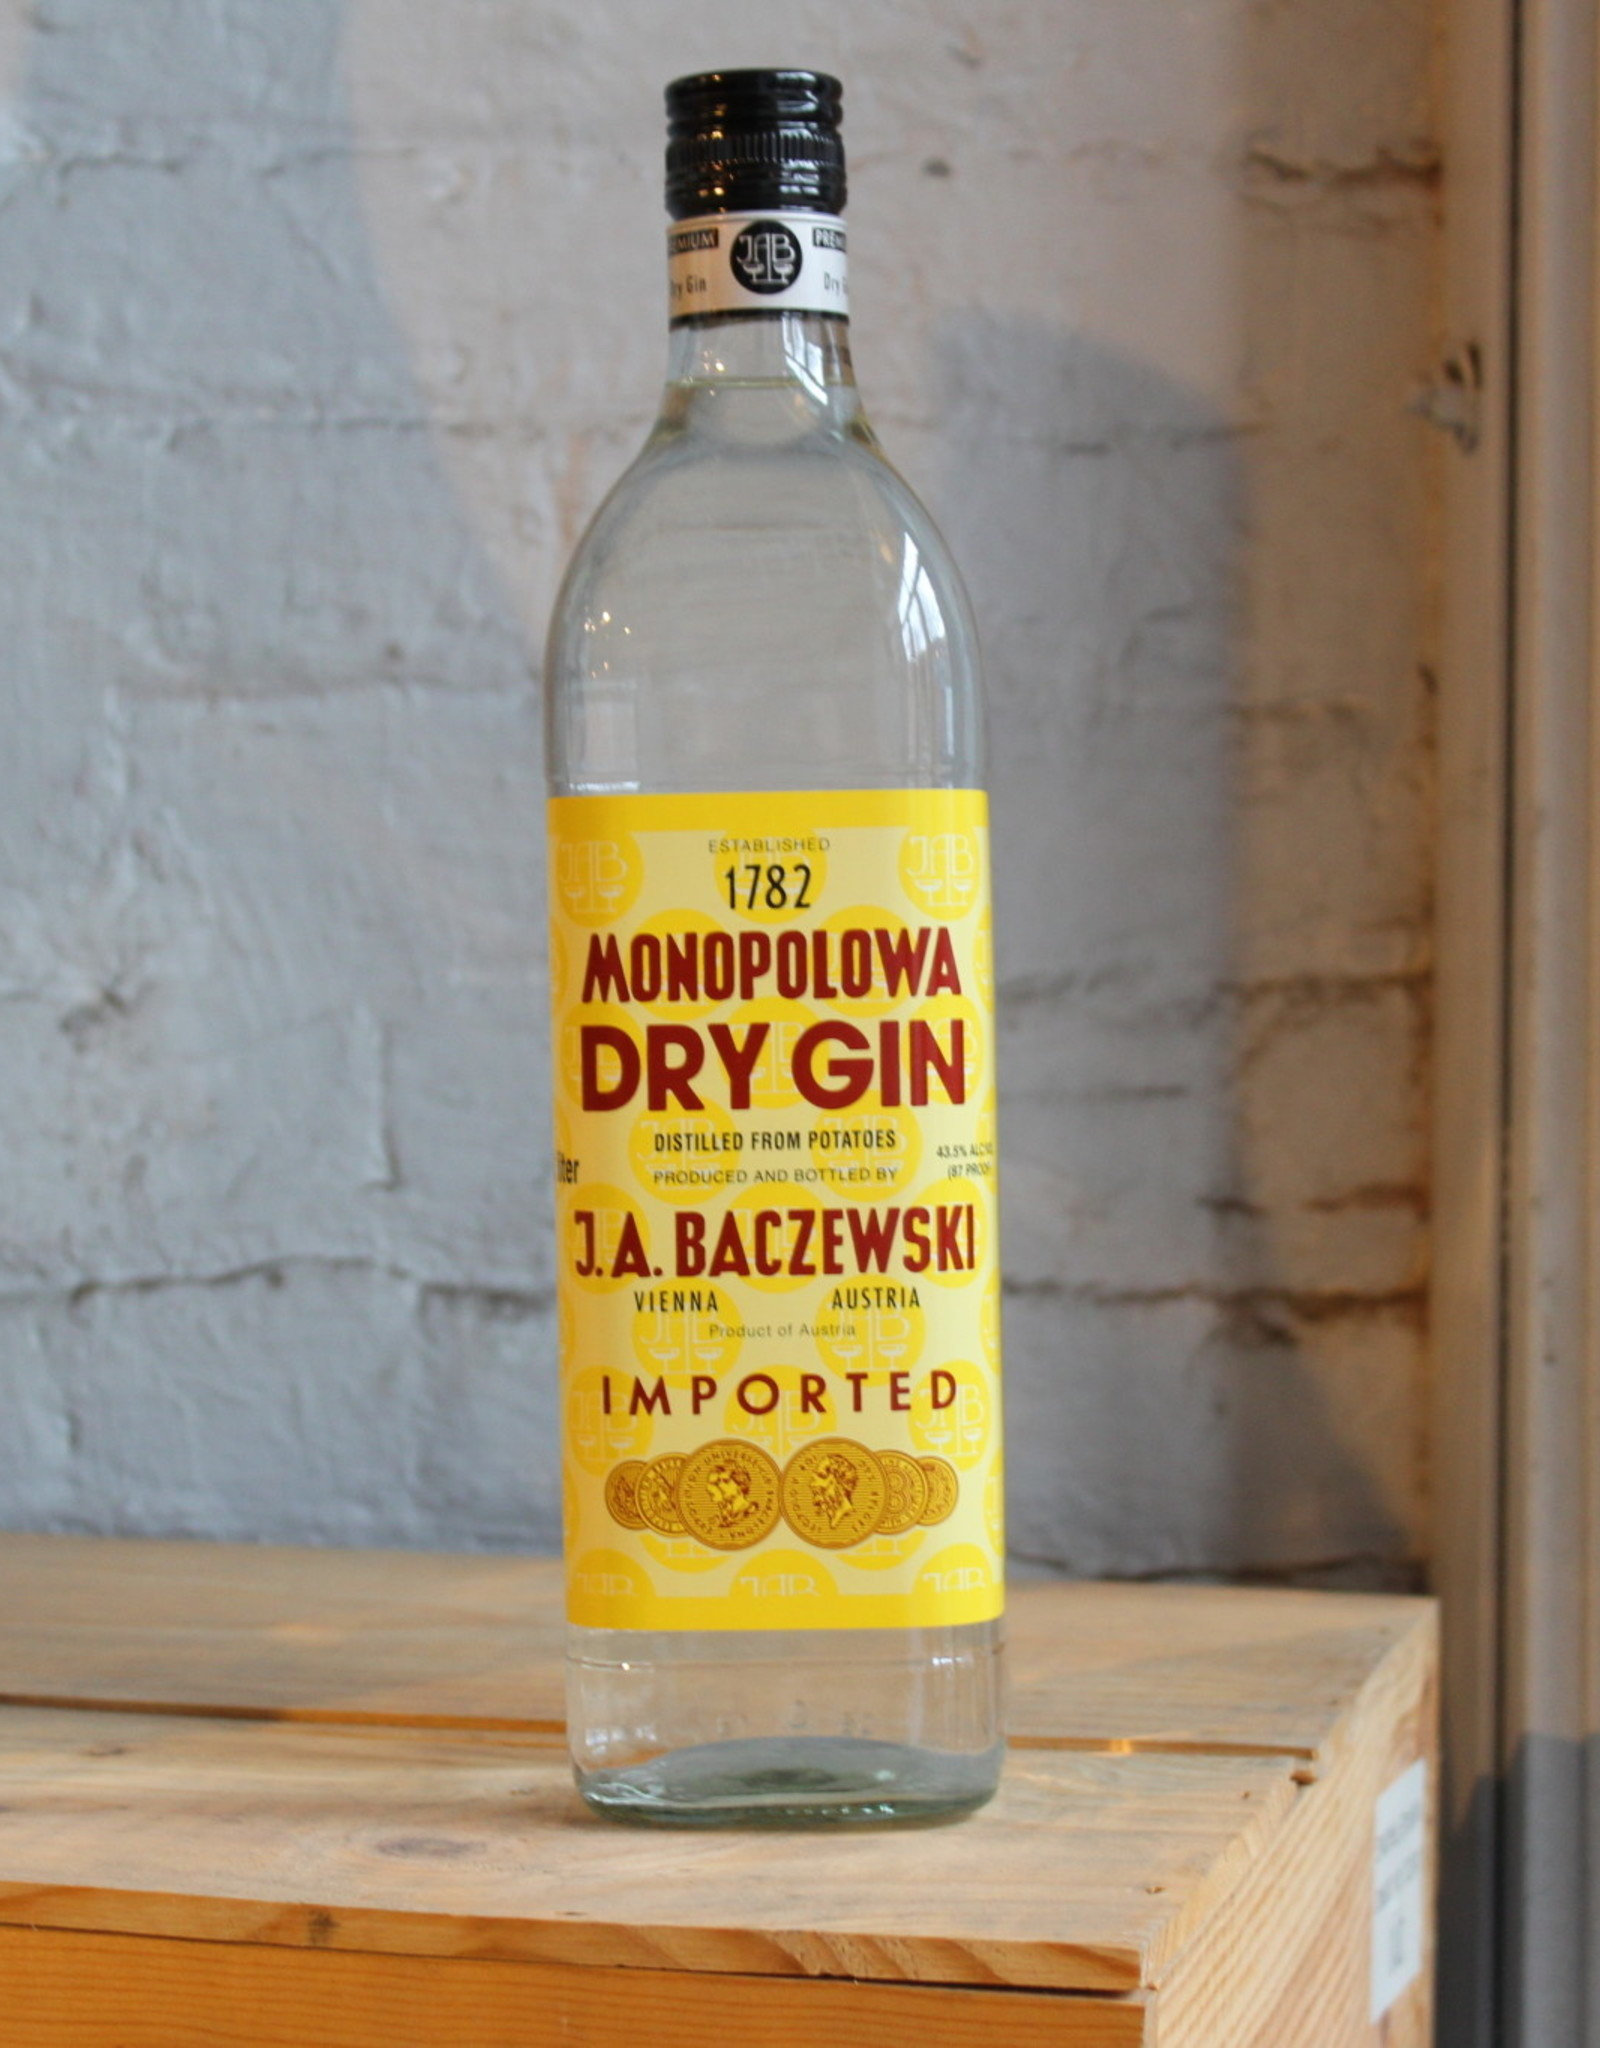 Monopolowa Gin - Vienna, Austria (1Ltr)